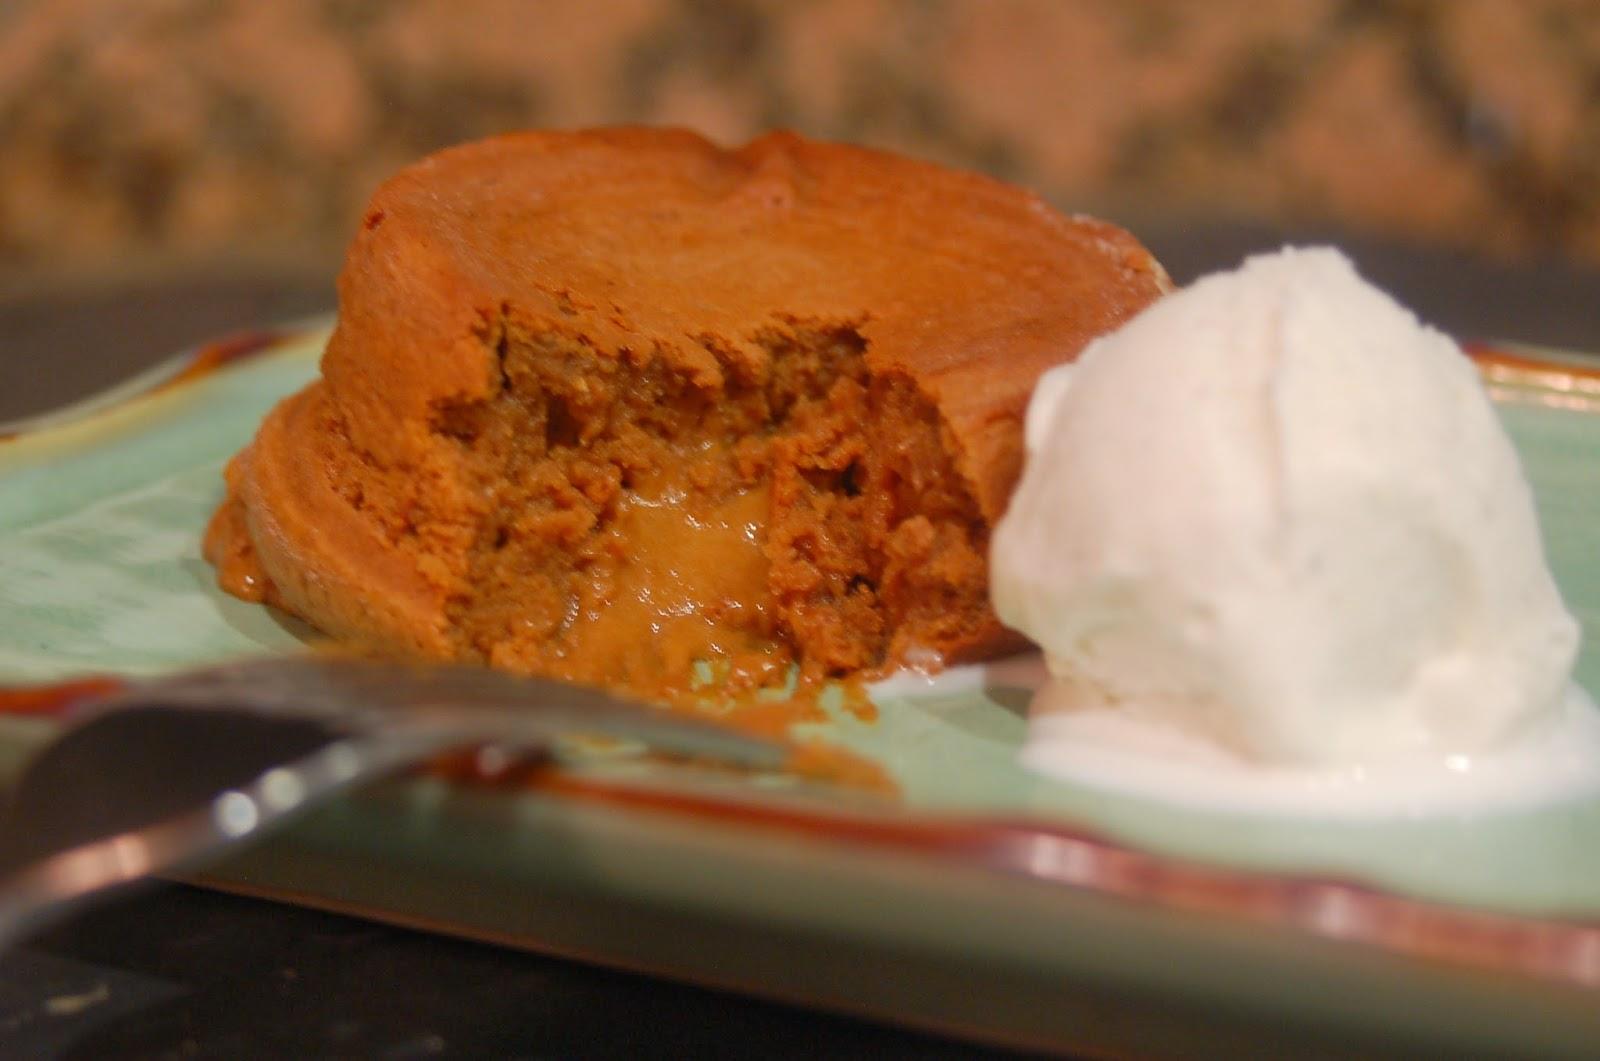 Eating Suburbia: Week 15: Molten Dulce de Leche Cakes